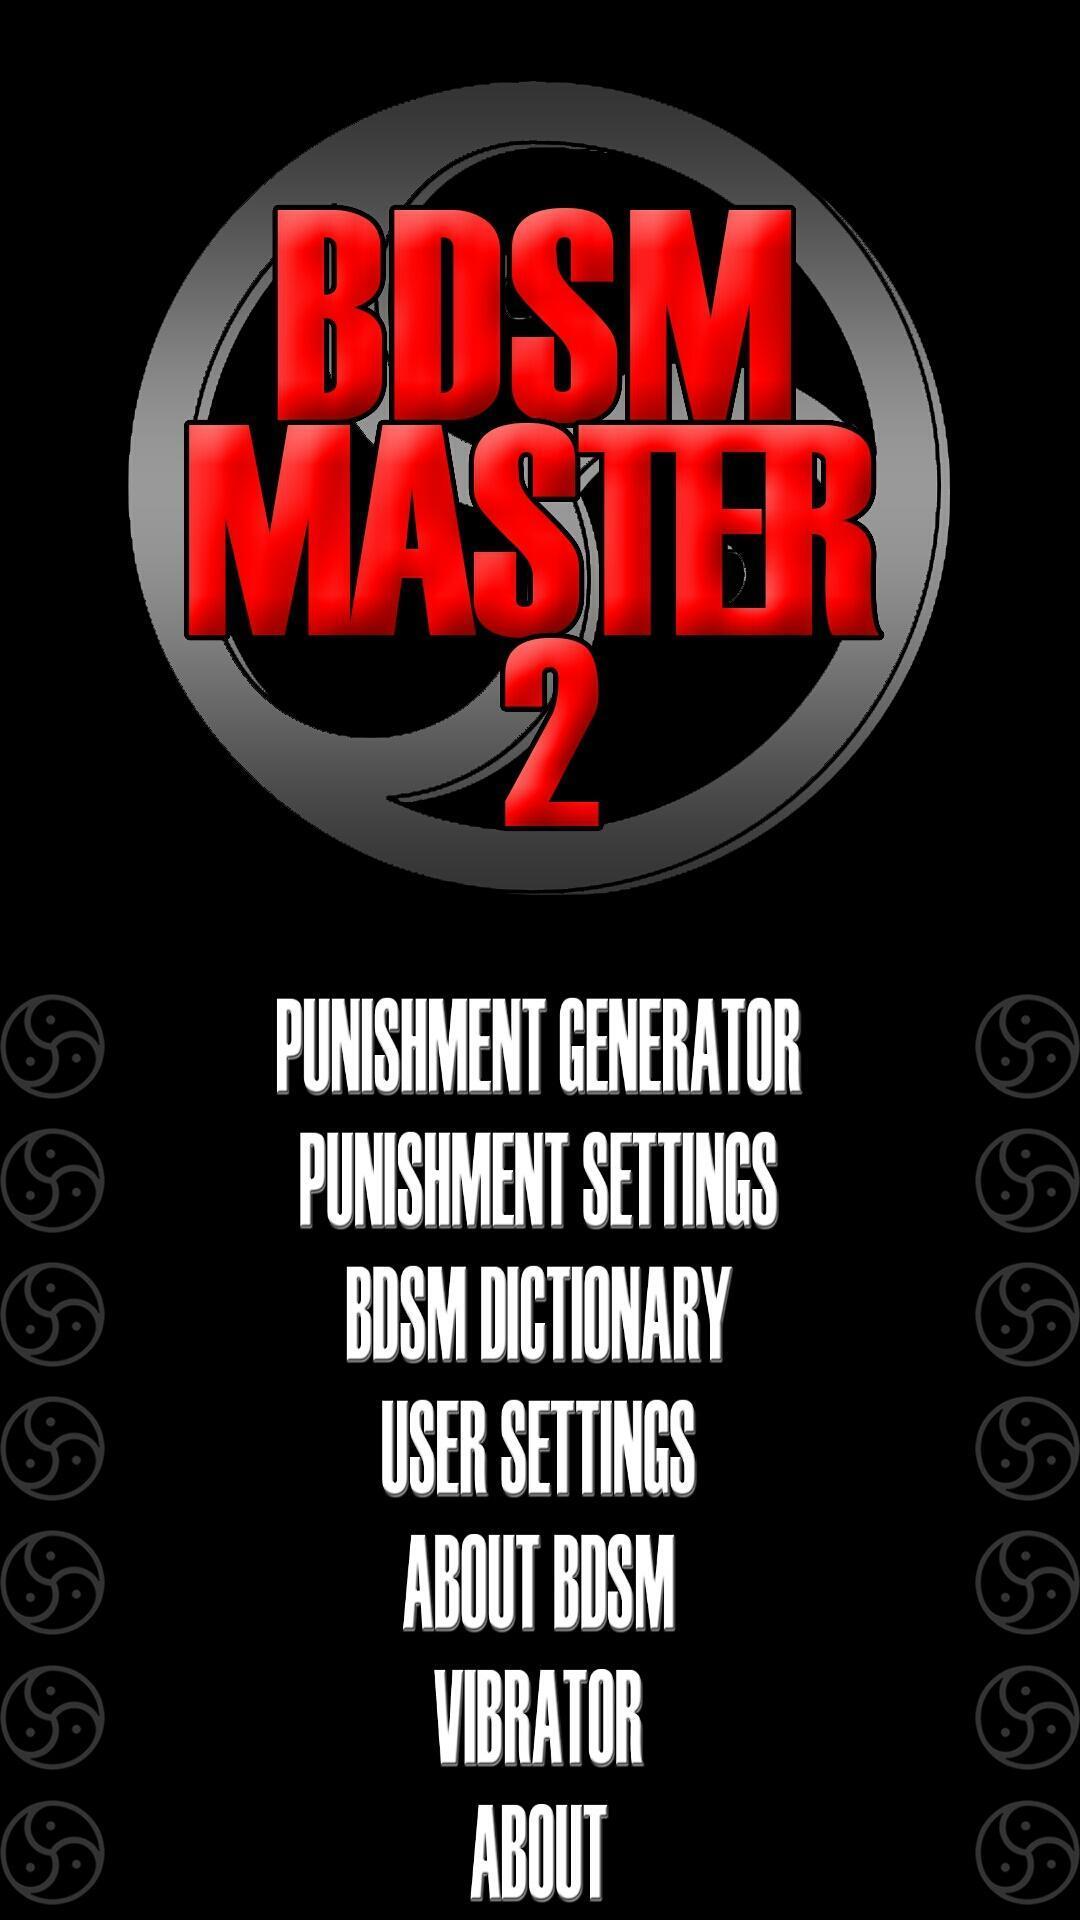 program Virtual bdsm master